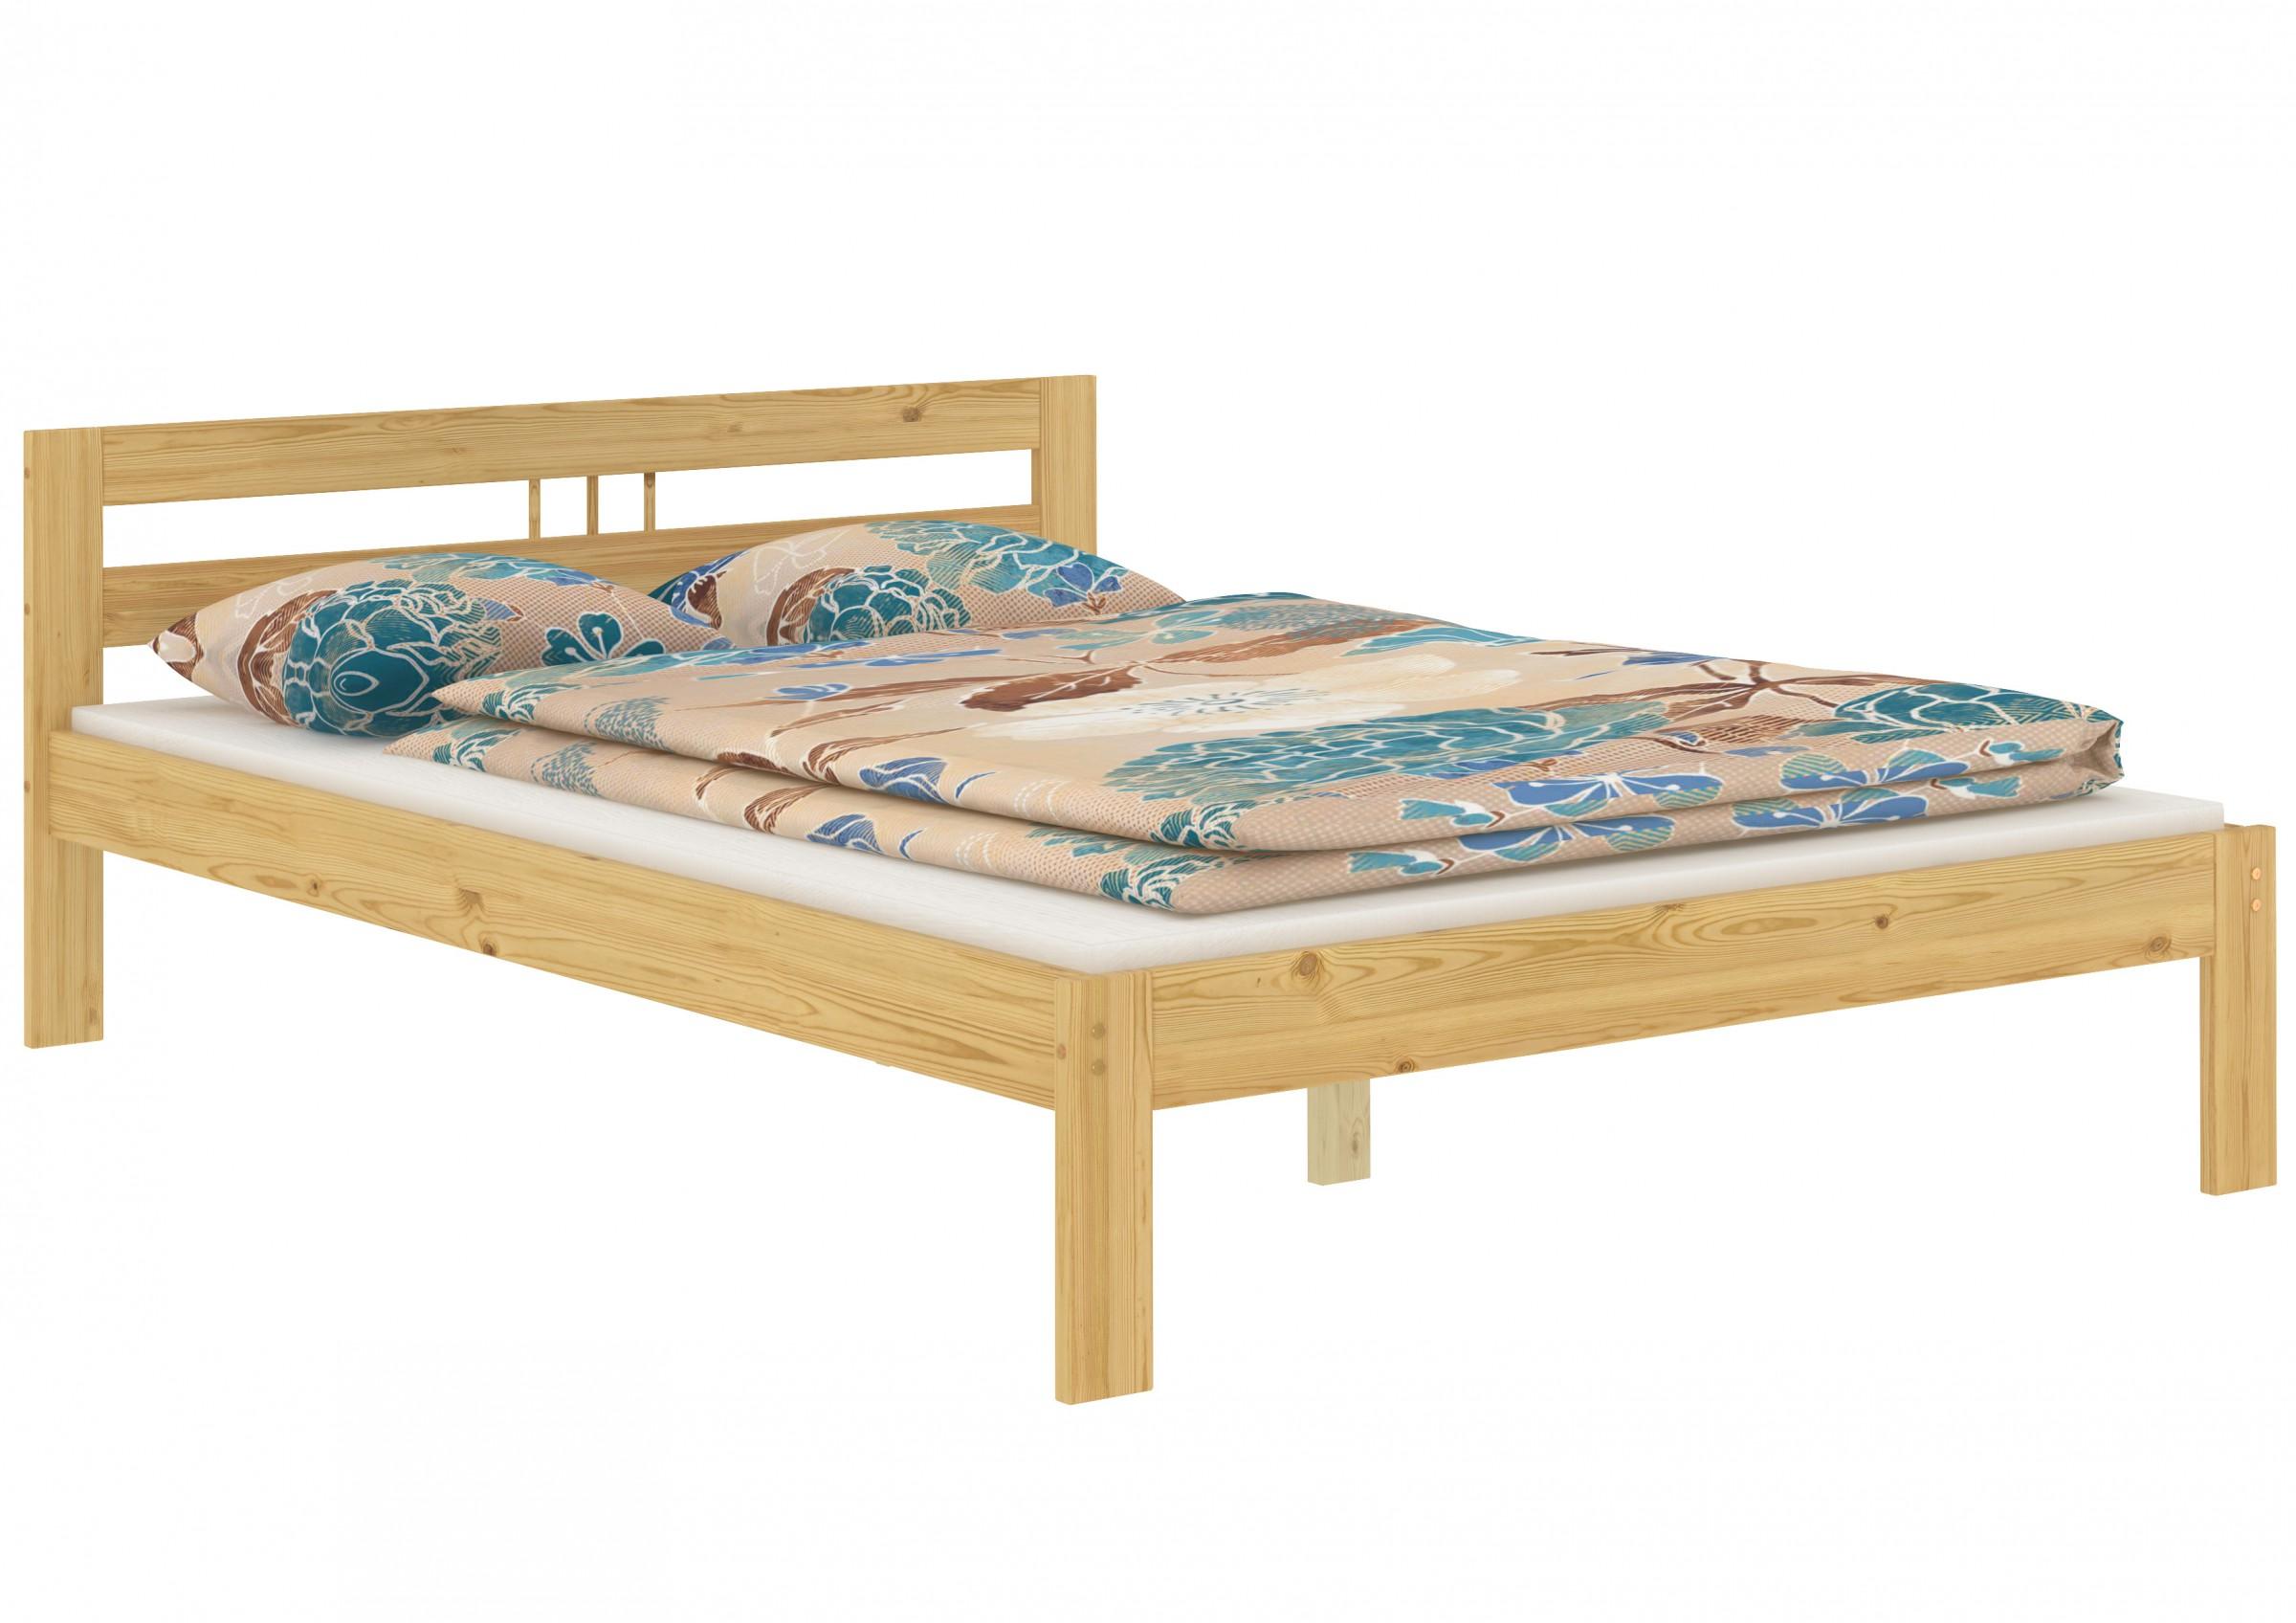 fsn franz sisches bett kiefer massiv 140x200 cm. Black Bedroom Furniture Sets. Home Design Ideas